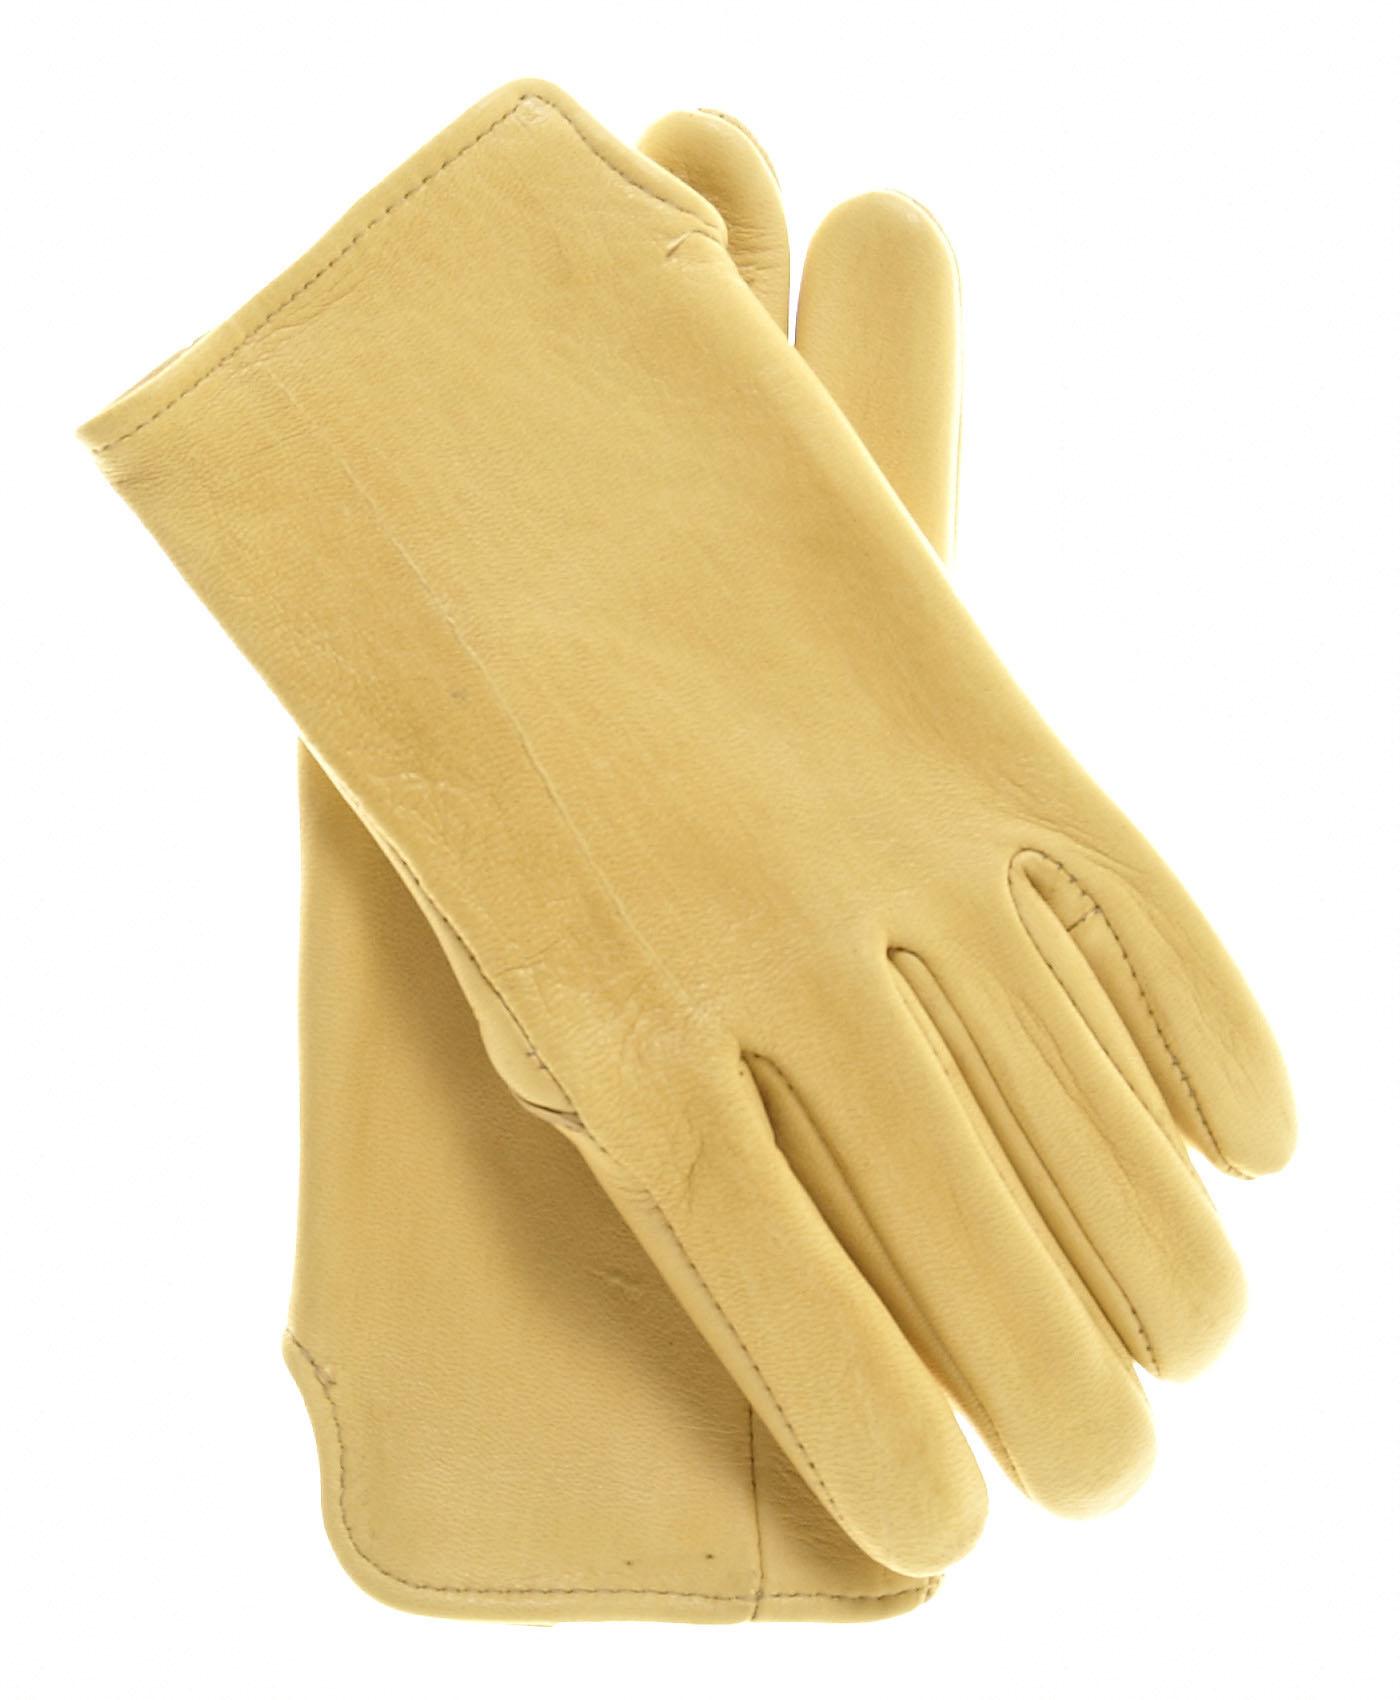 Geier Glove Men's Thinsulate Lined Elkskin Gloves